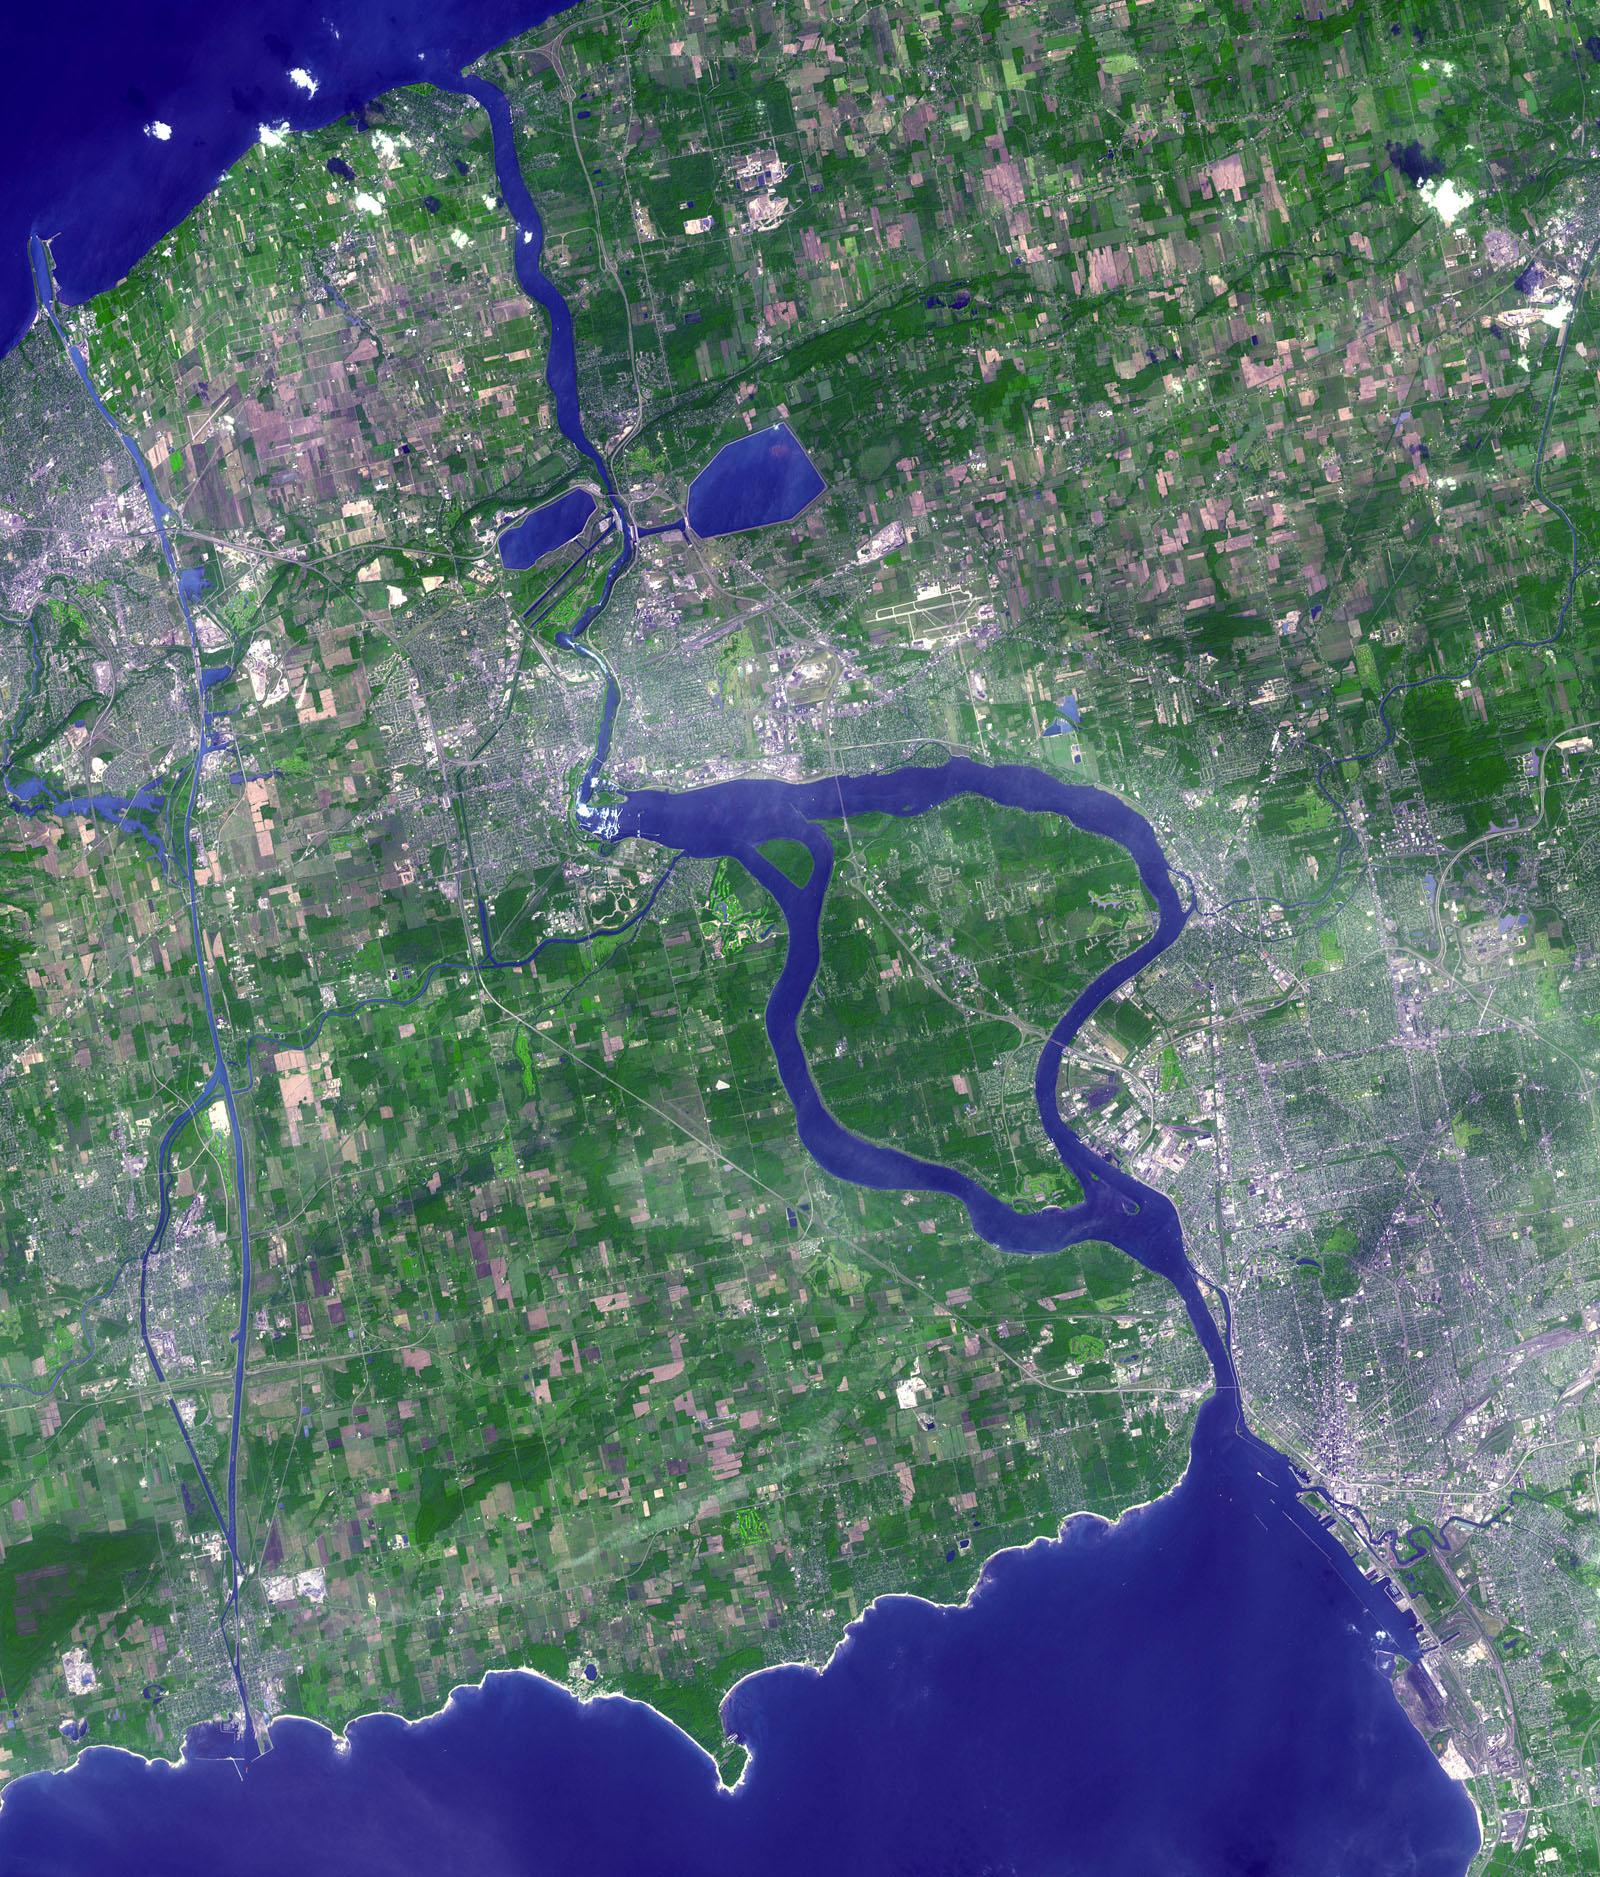 http://upload.wikimedia.org/wikipedia/commons/d/d5/NiagaraRiverNASA.jpg